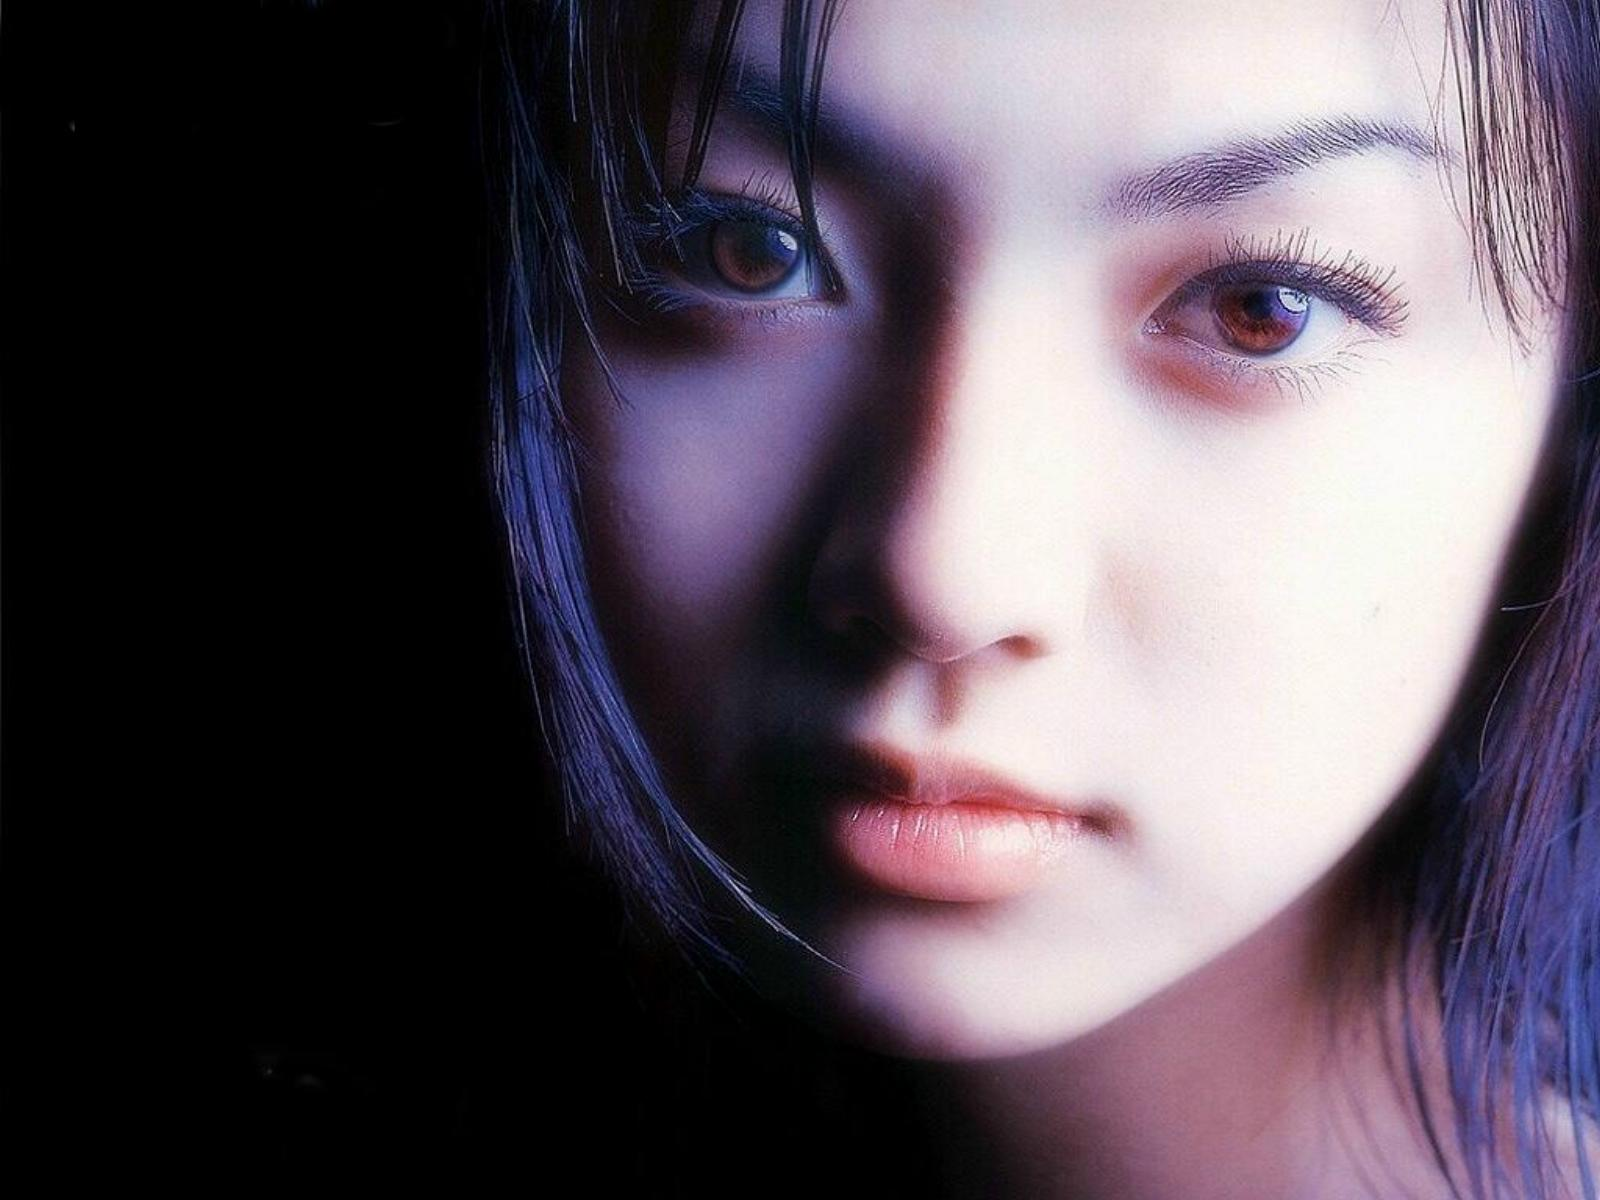 Kyoko Fukada nude (83 photo), Ass, Cleavage, Twitter, braless 2006